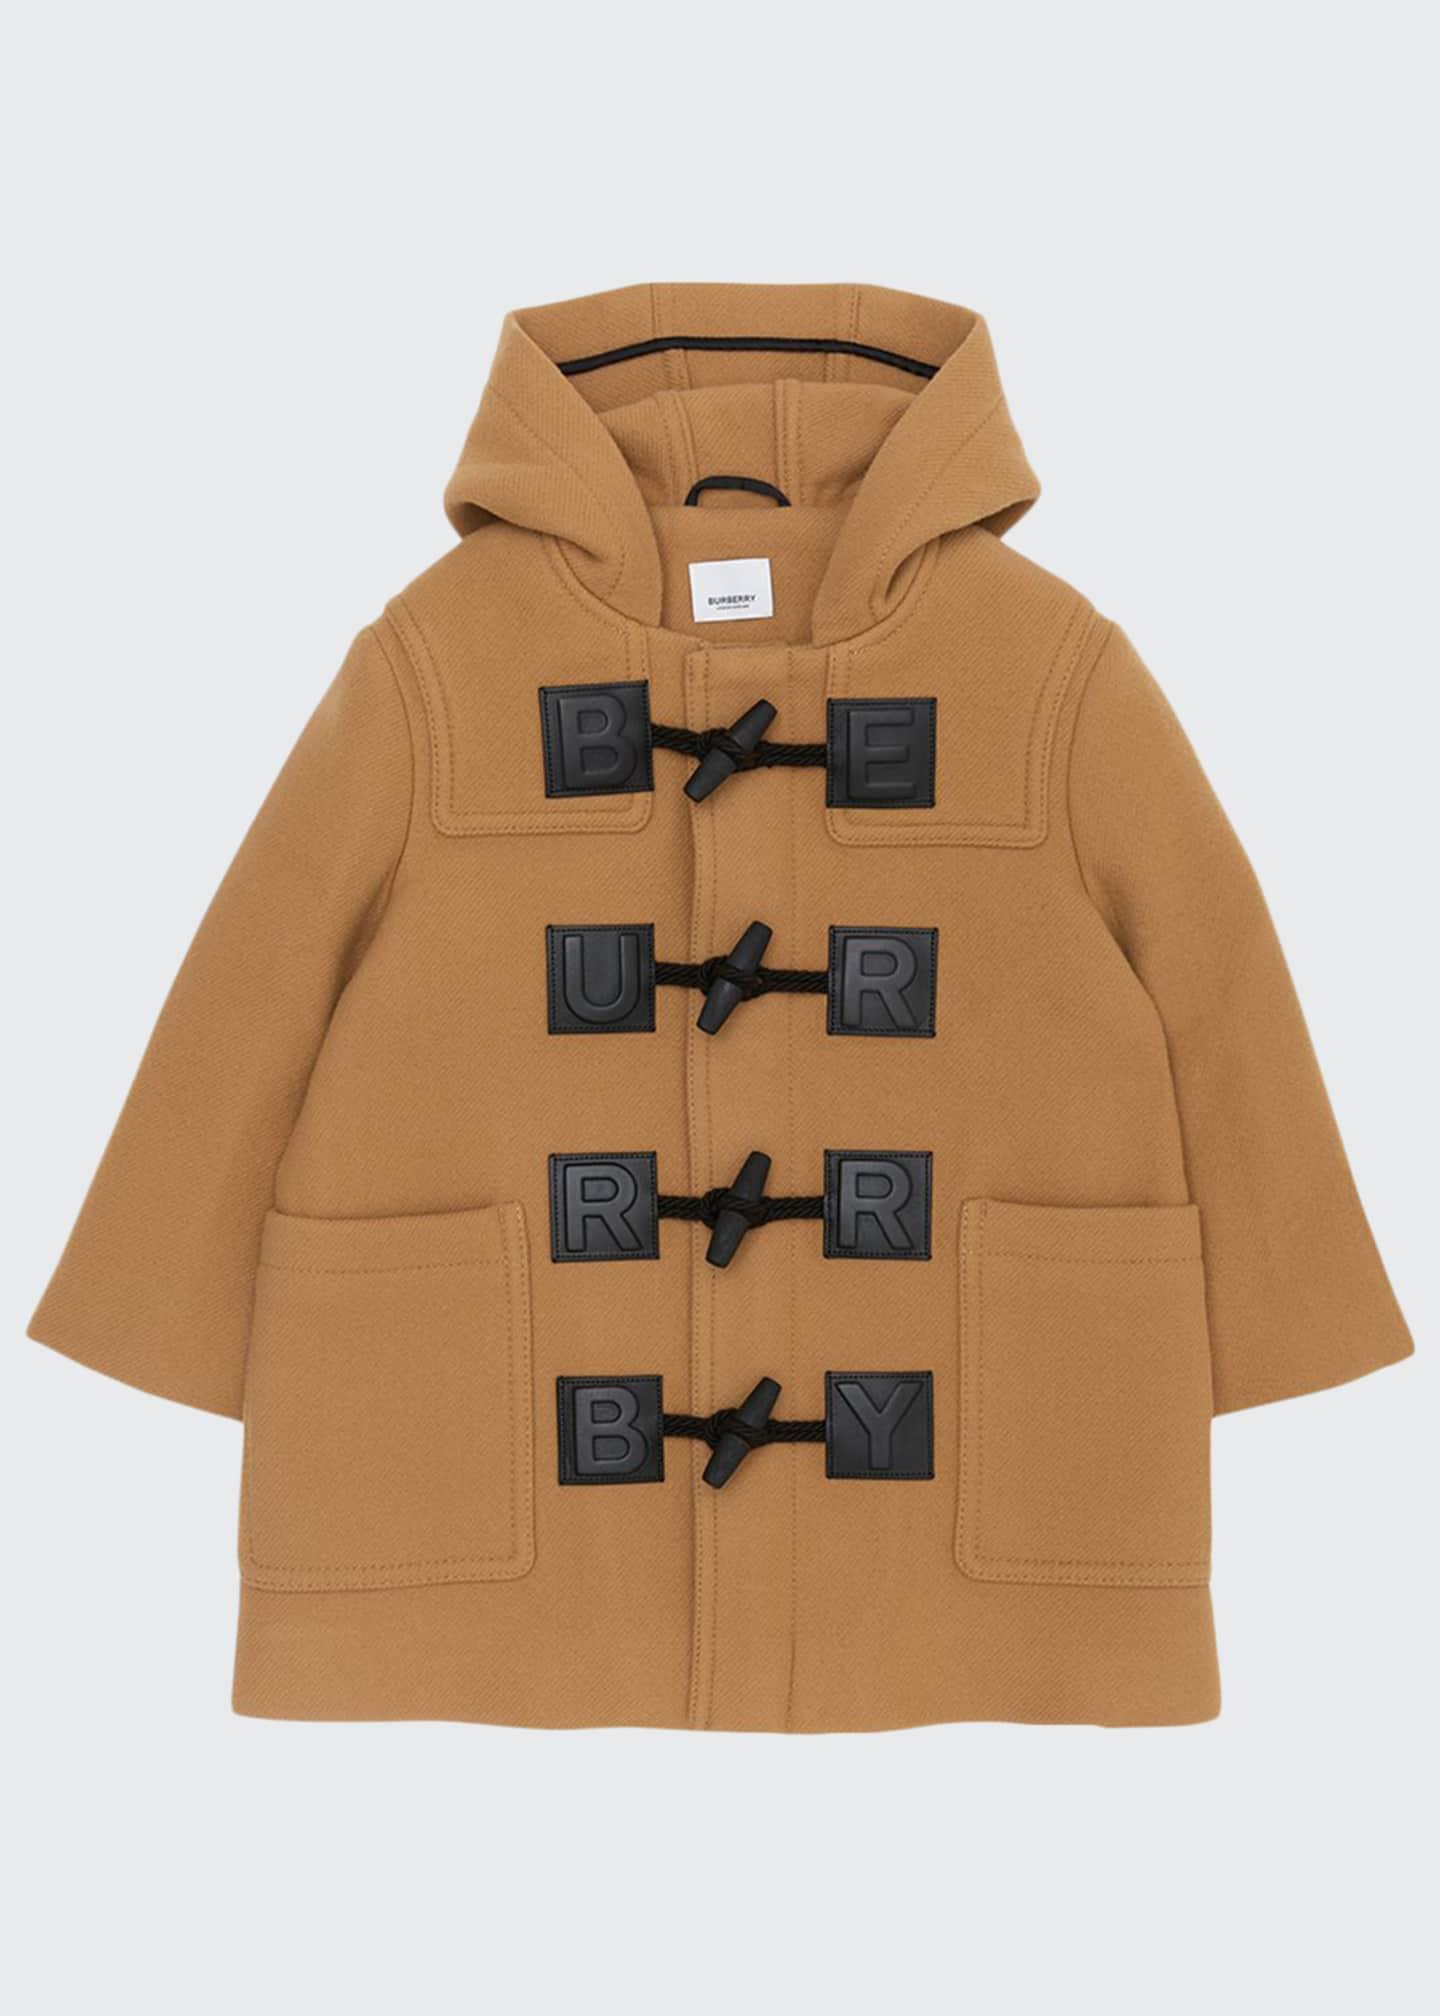 Burberry Girl's Braydon Duffel Coat w/ Leather Logo